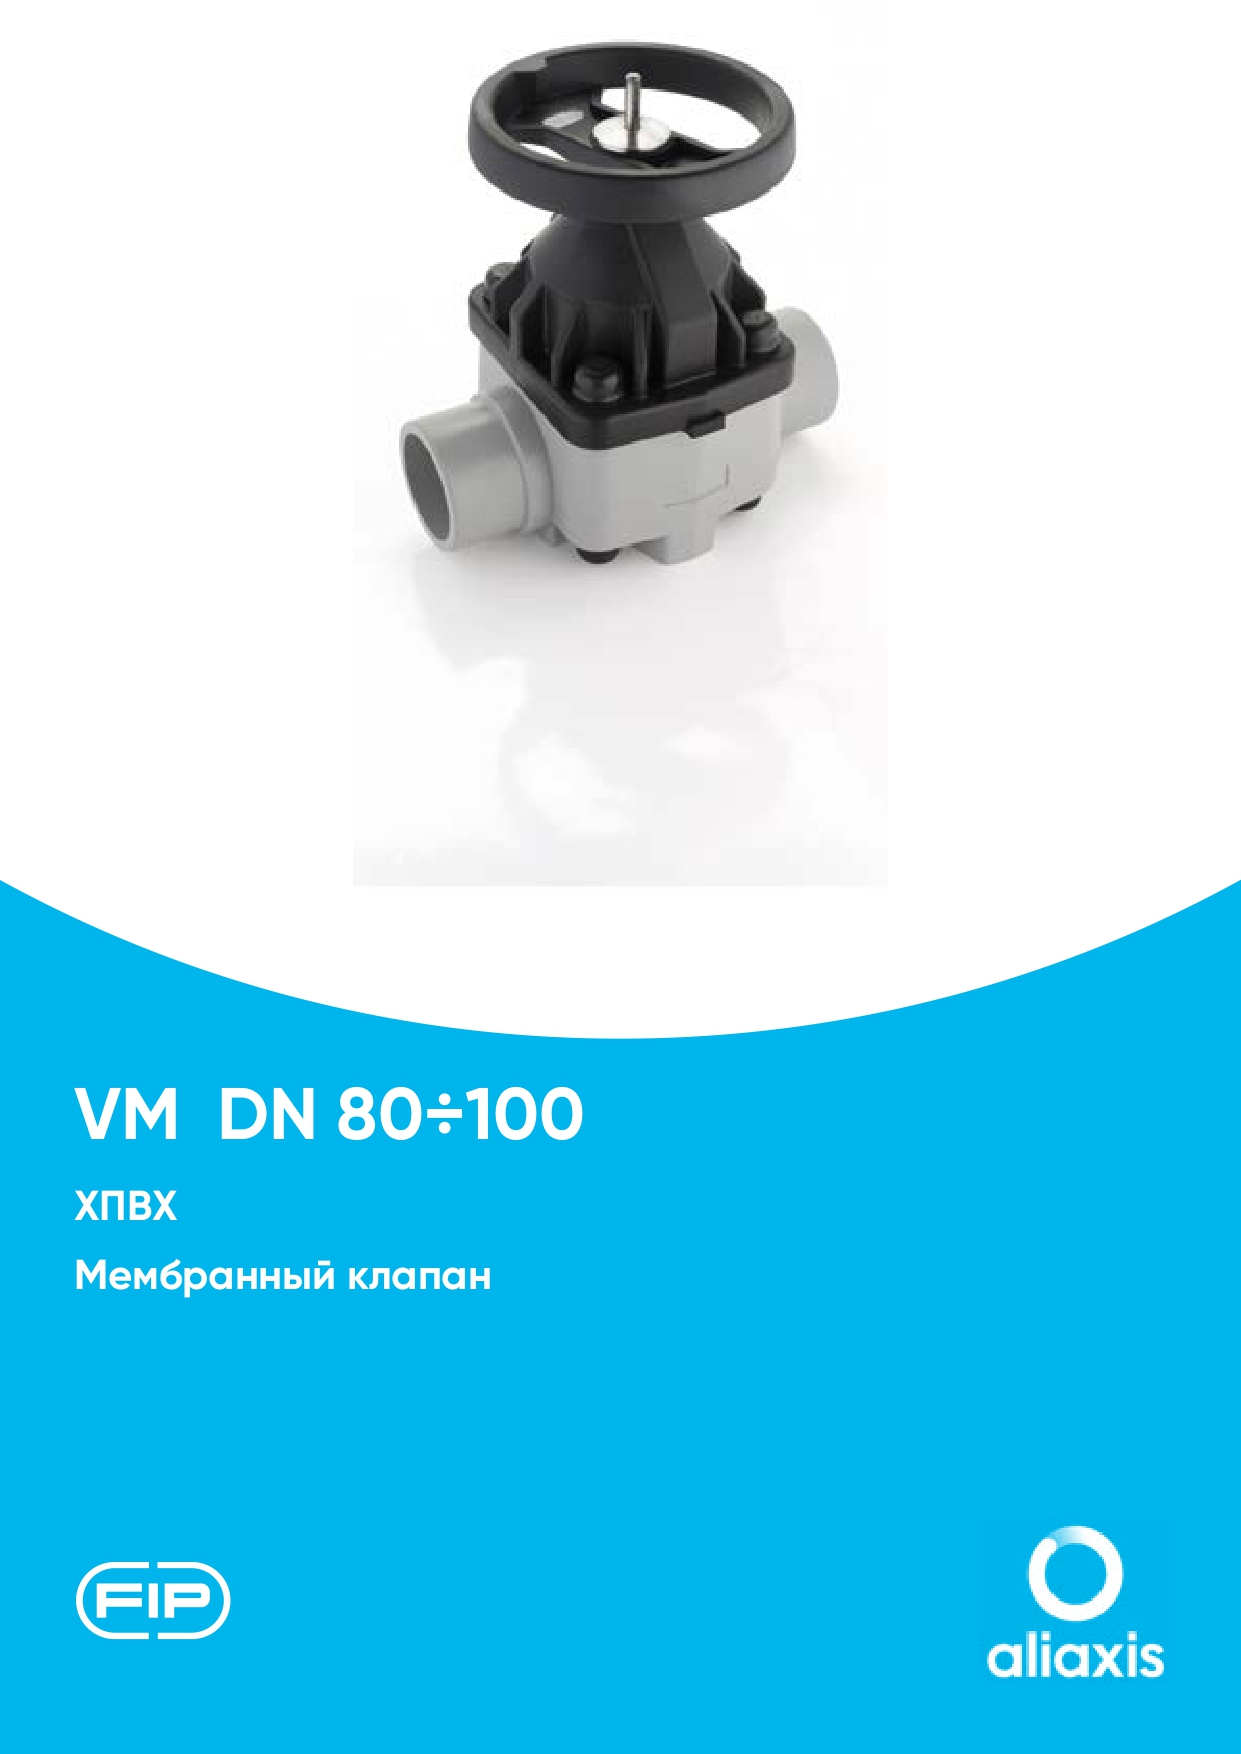 Мембранные клапаны VM DN80-100 из ХПВХ